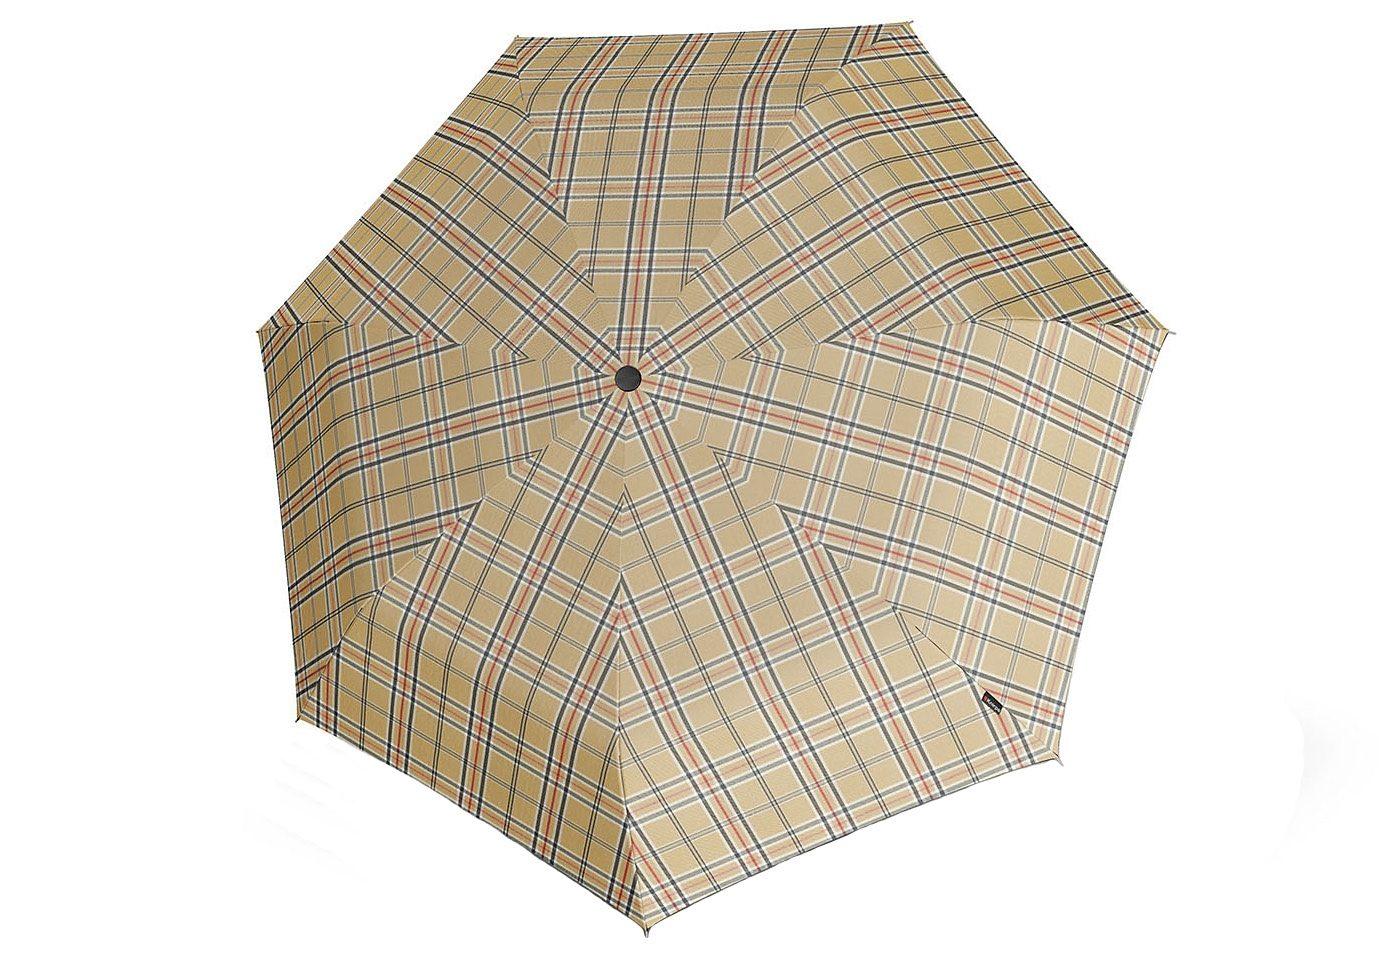 Knirps®, Taschenregenschirm Piccolo | Accessoires > Regenschirme > Sonstige Regenschirme | Bunt | Polyester | knirps